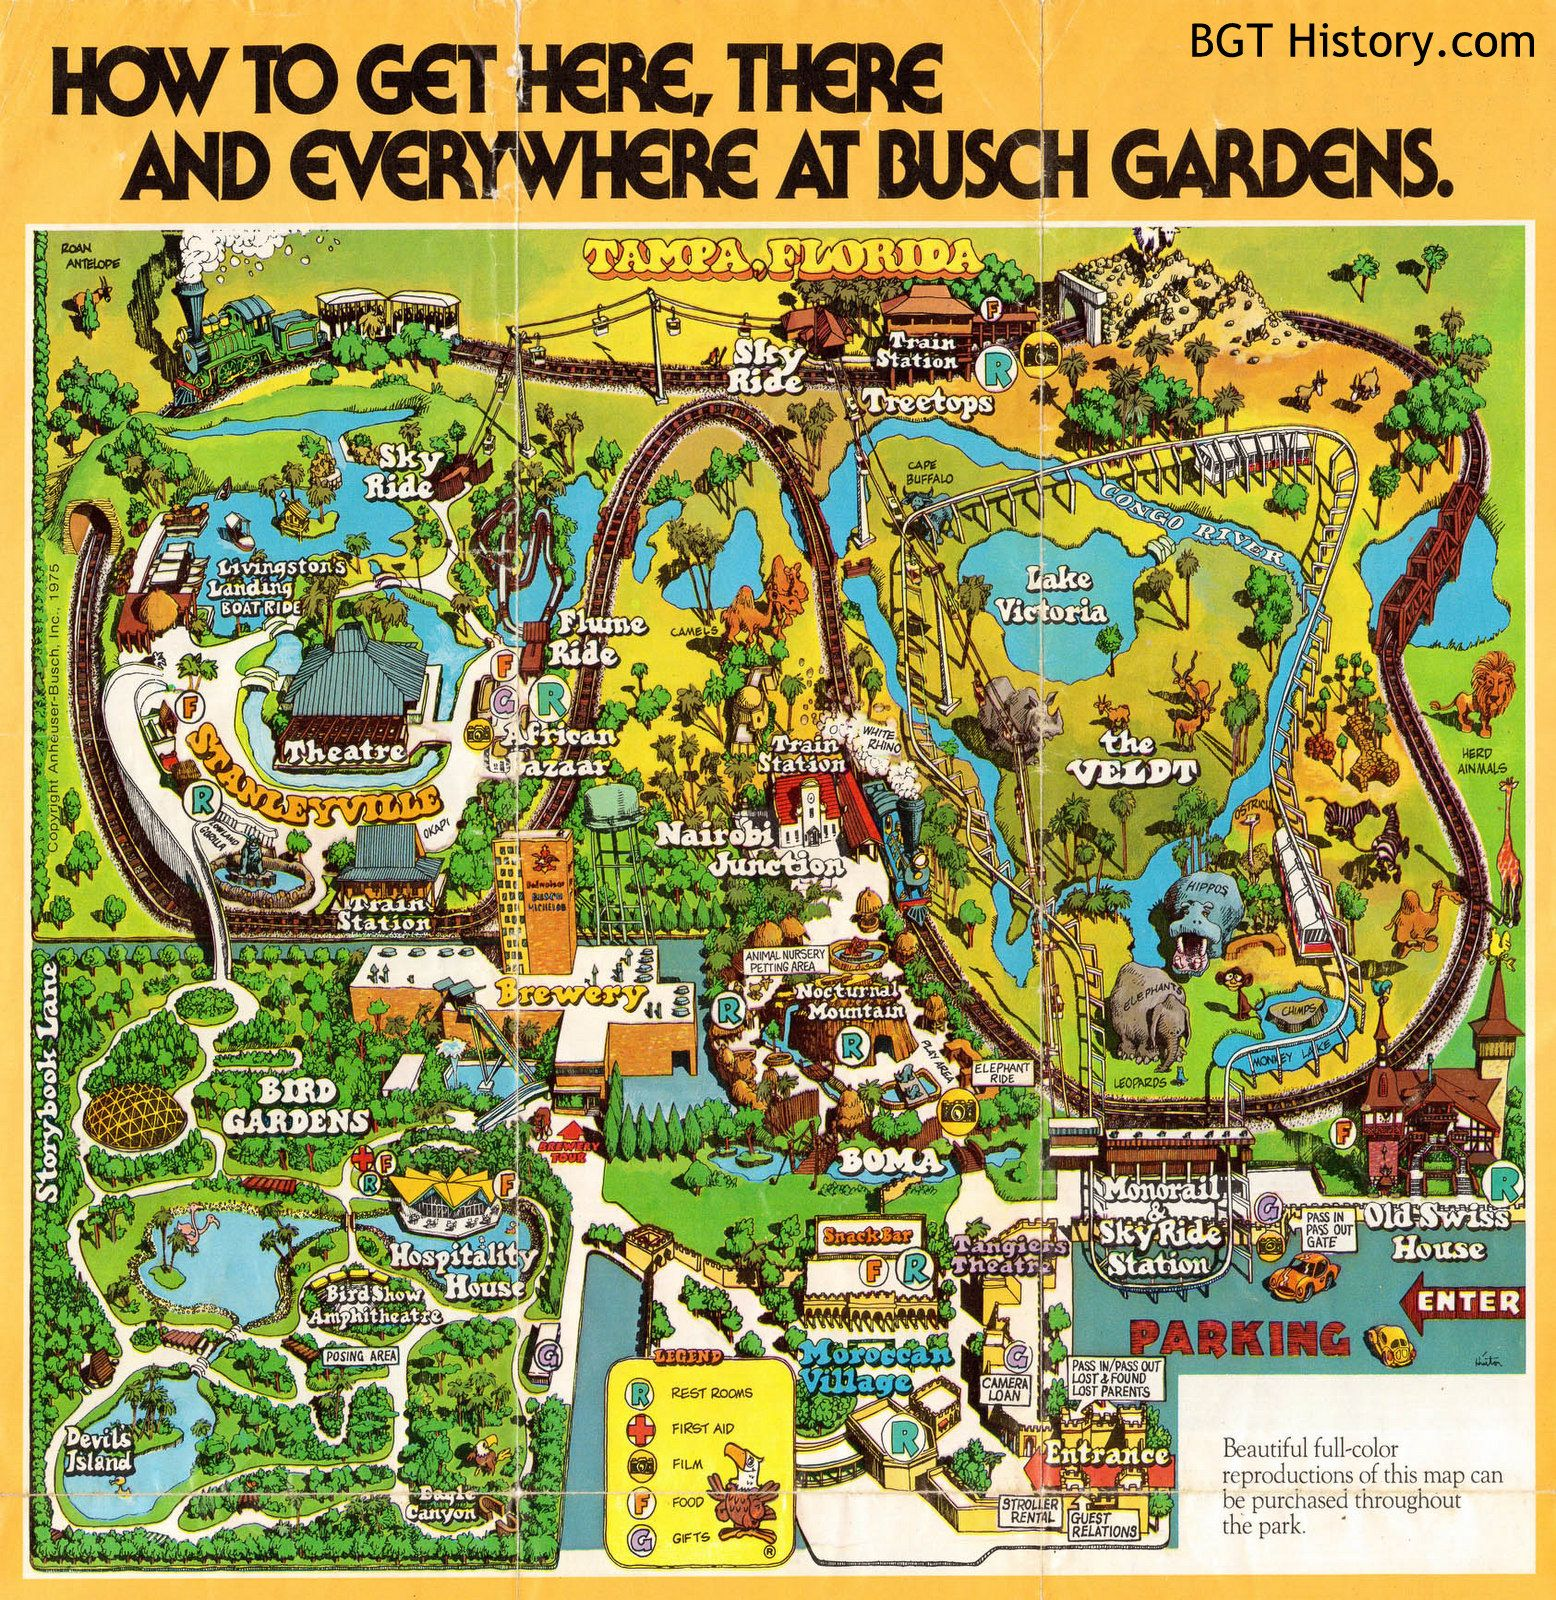 3995fa4a74c5a65f0d75afbf3c83e179 - Busch Gardens Tampa Christmas Town Map